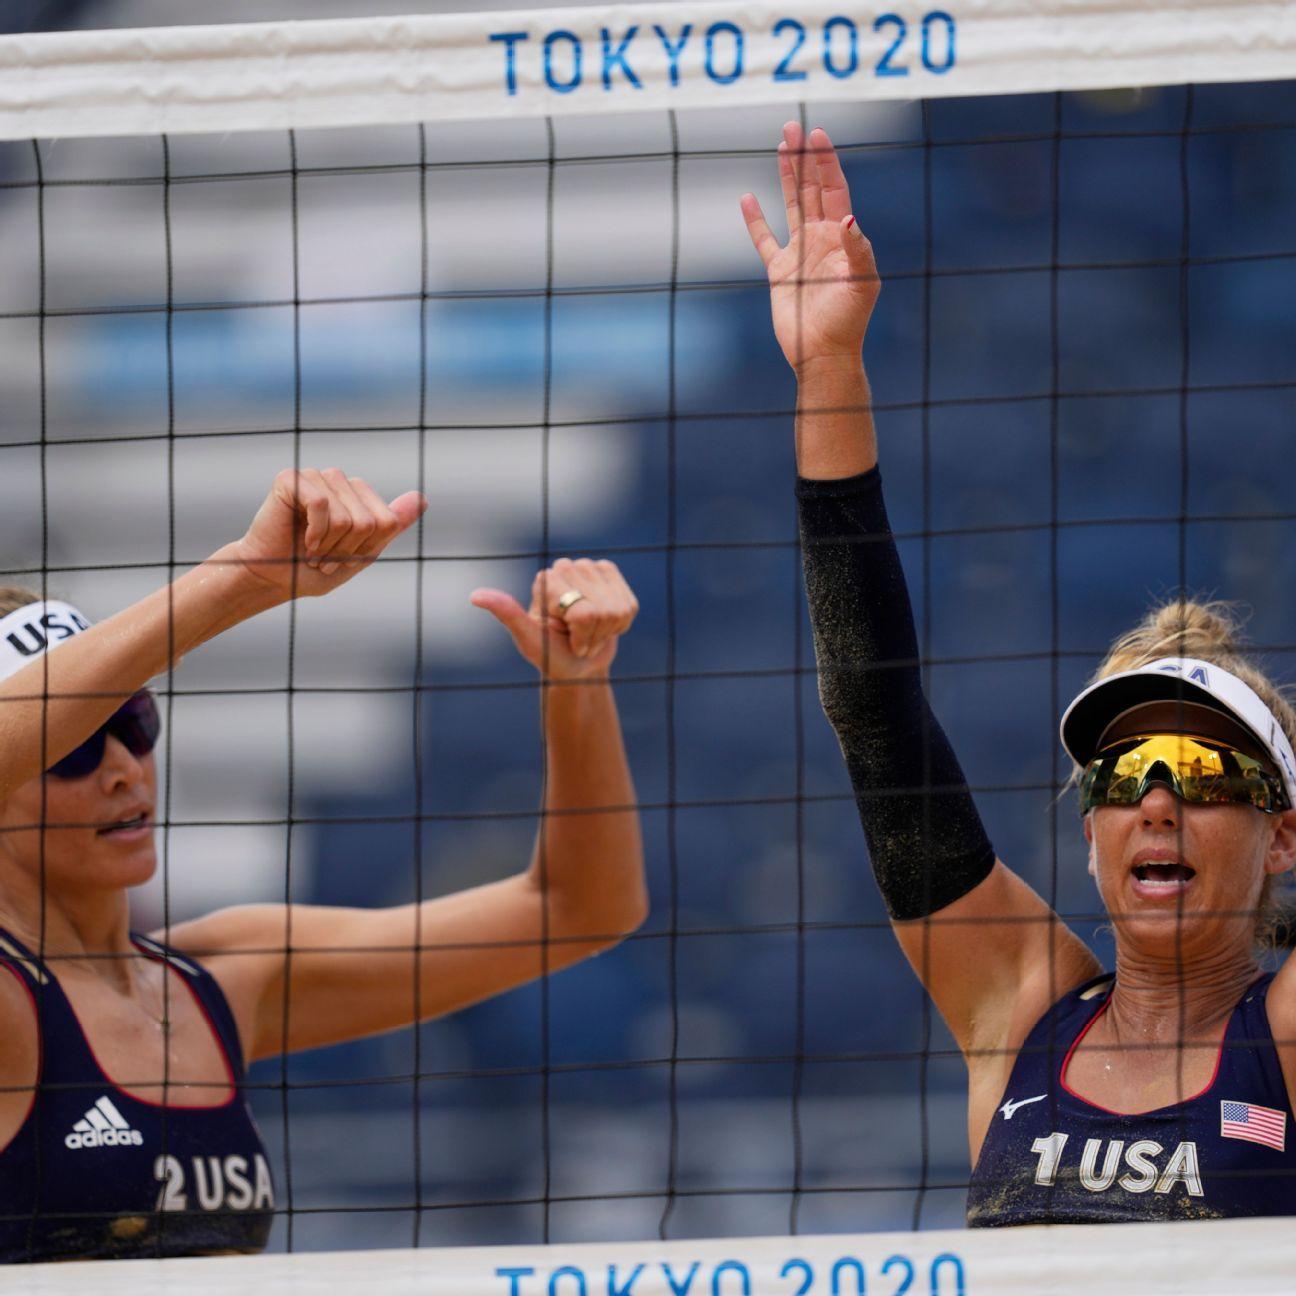 Ross, Klineman into beach volleyball quarterfinals